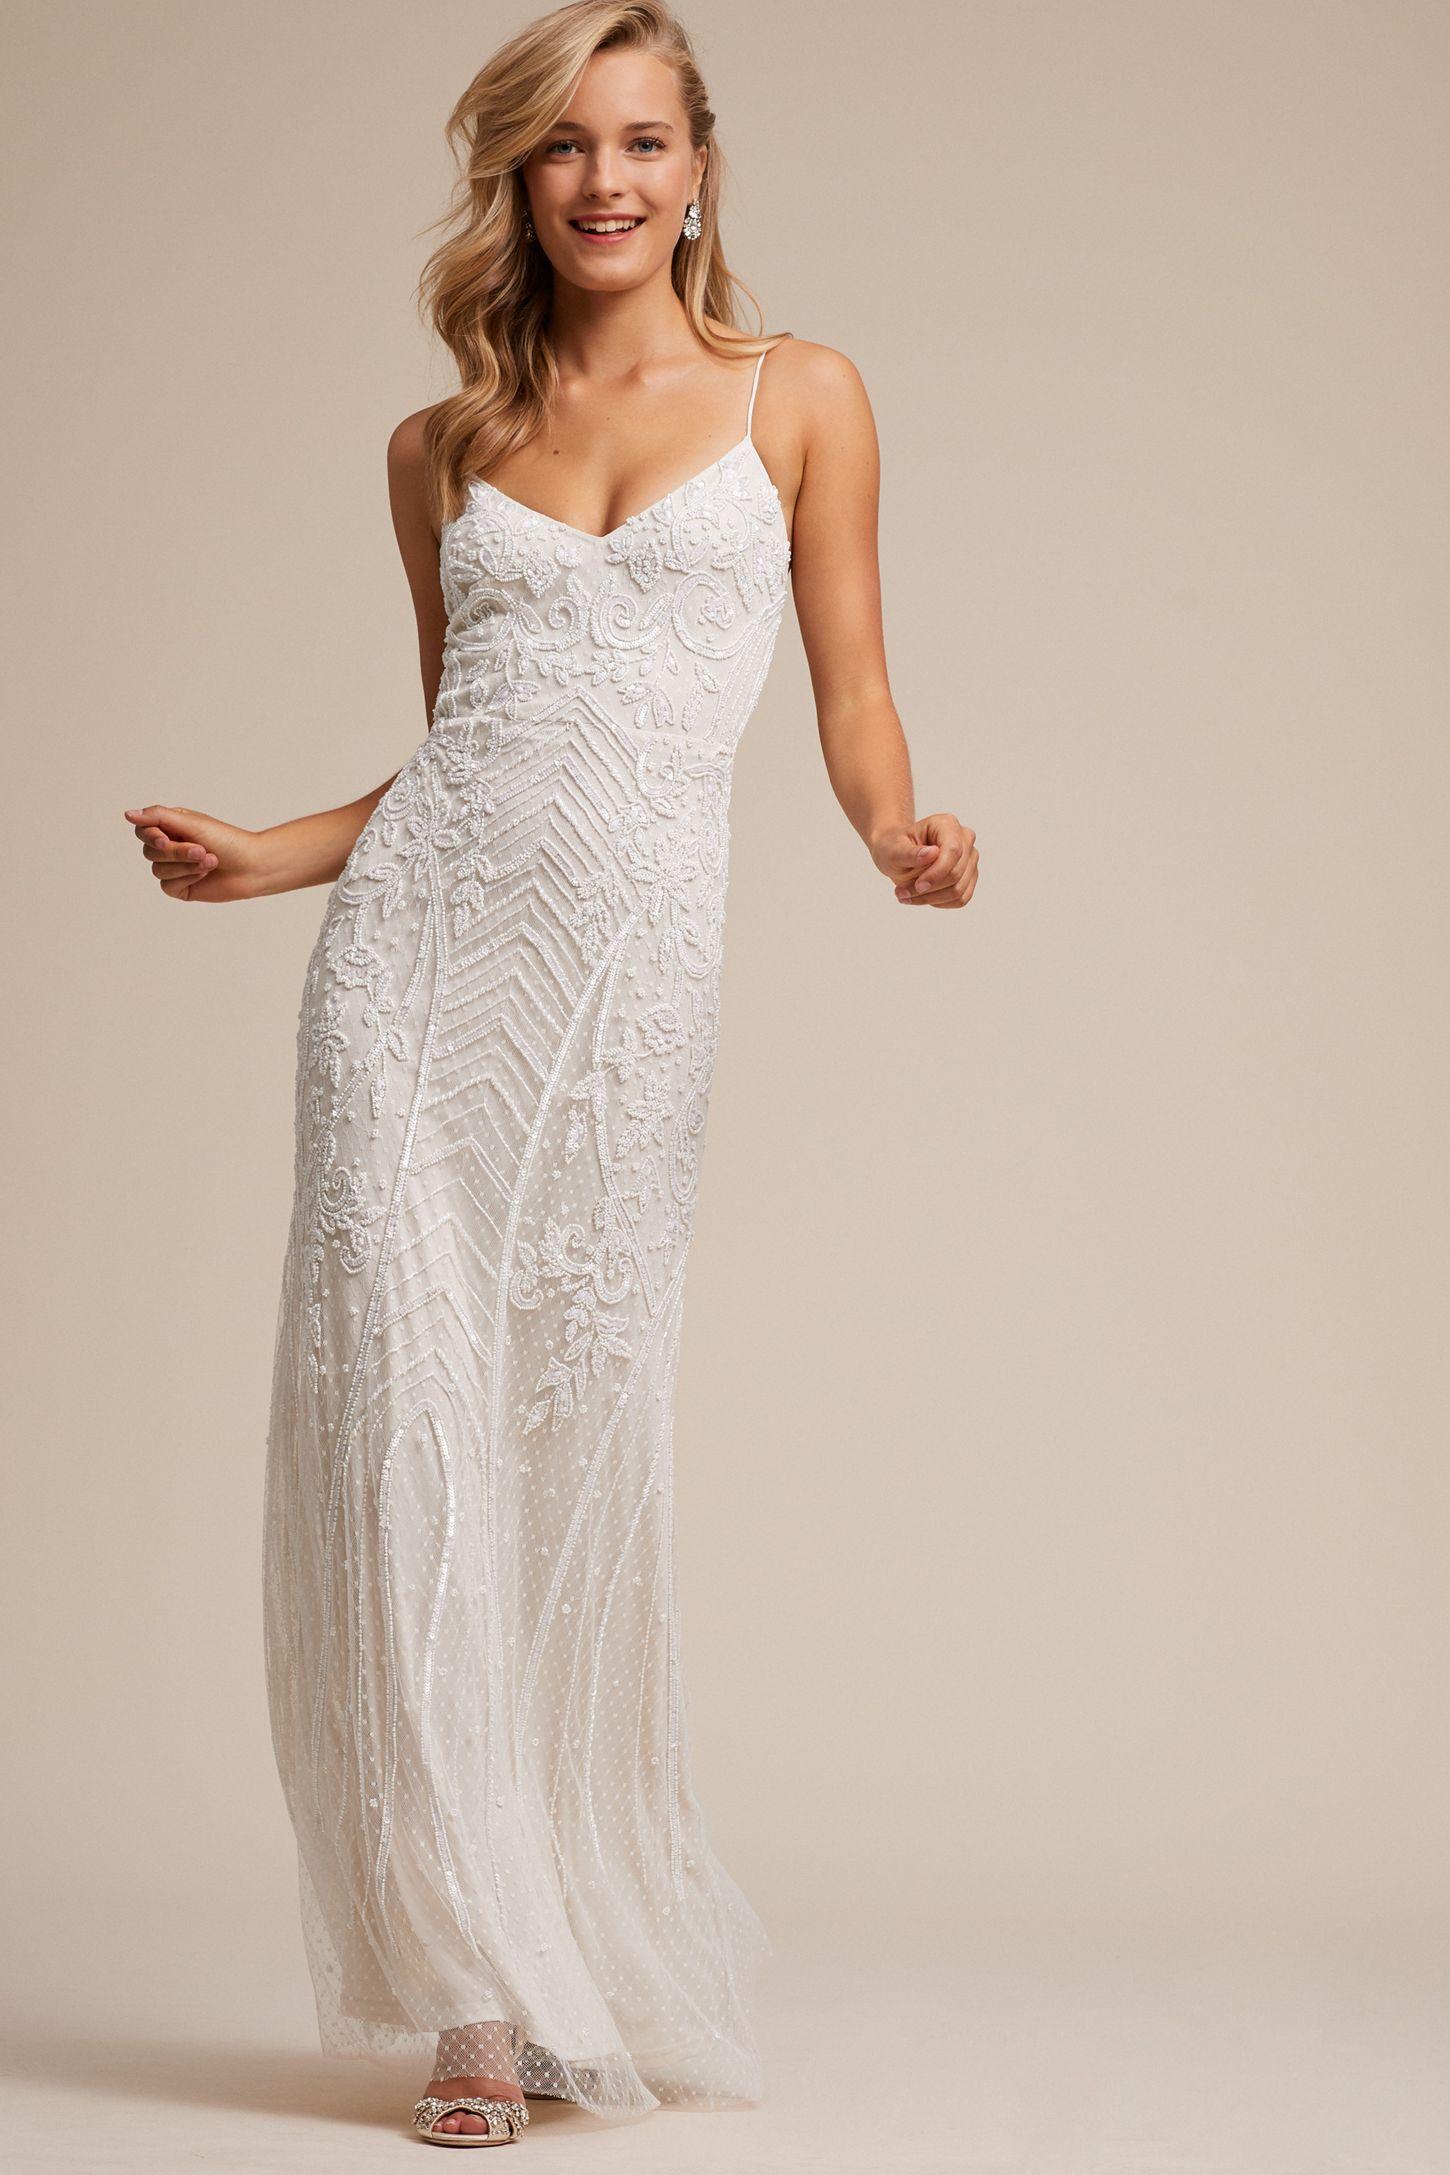 e057a238e411a Bhldn Wedding Dress Appointment – DACC